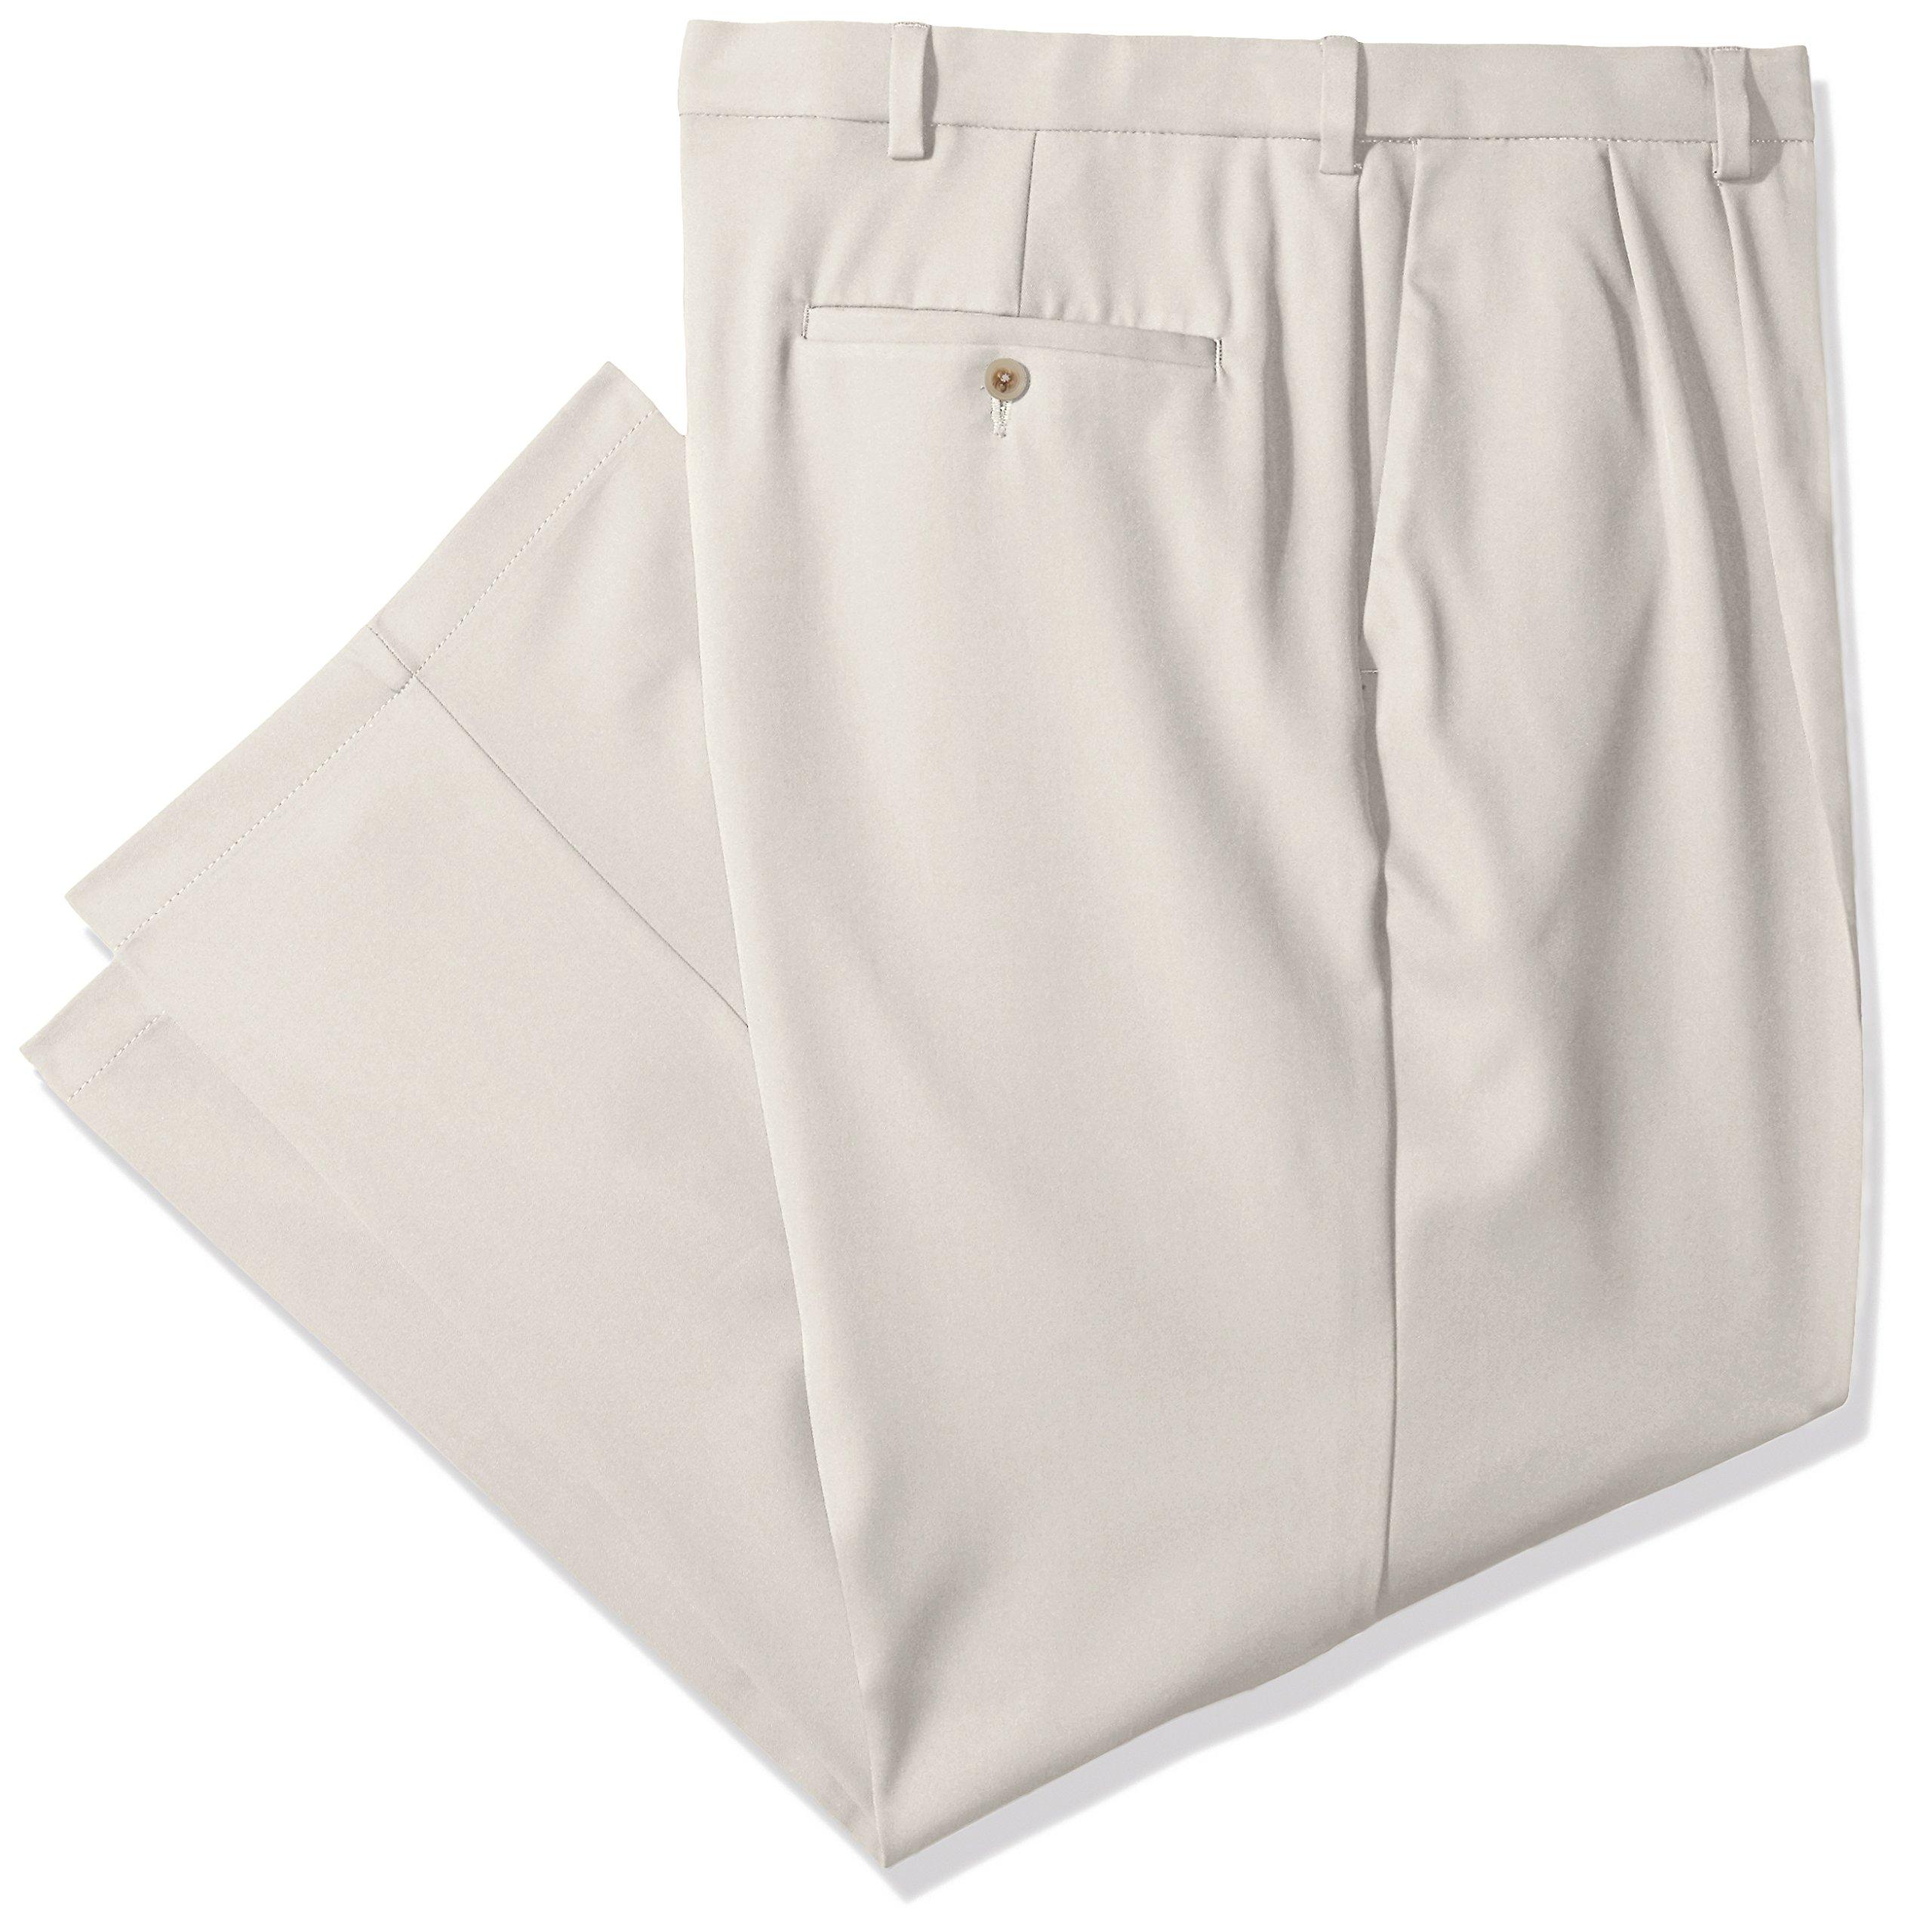 Haggar Men's Cool 18 Pro Classic Fit Pleat Front Expandable Waist Pant, String, 46Wx30L